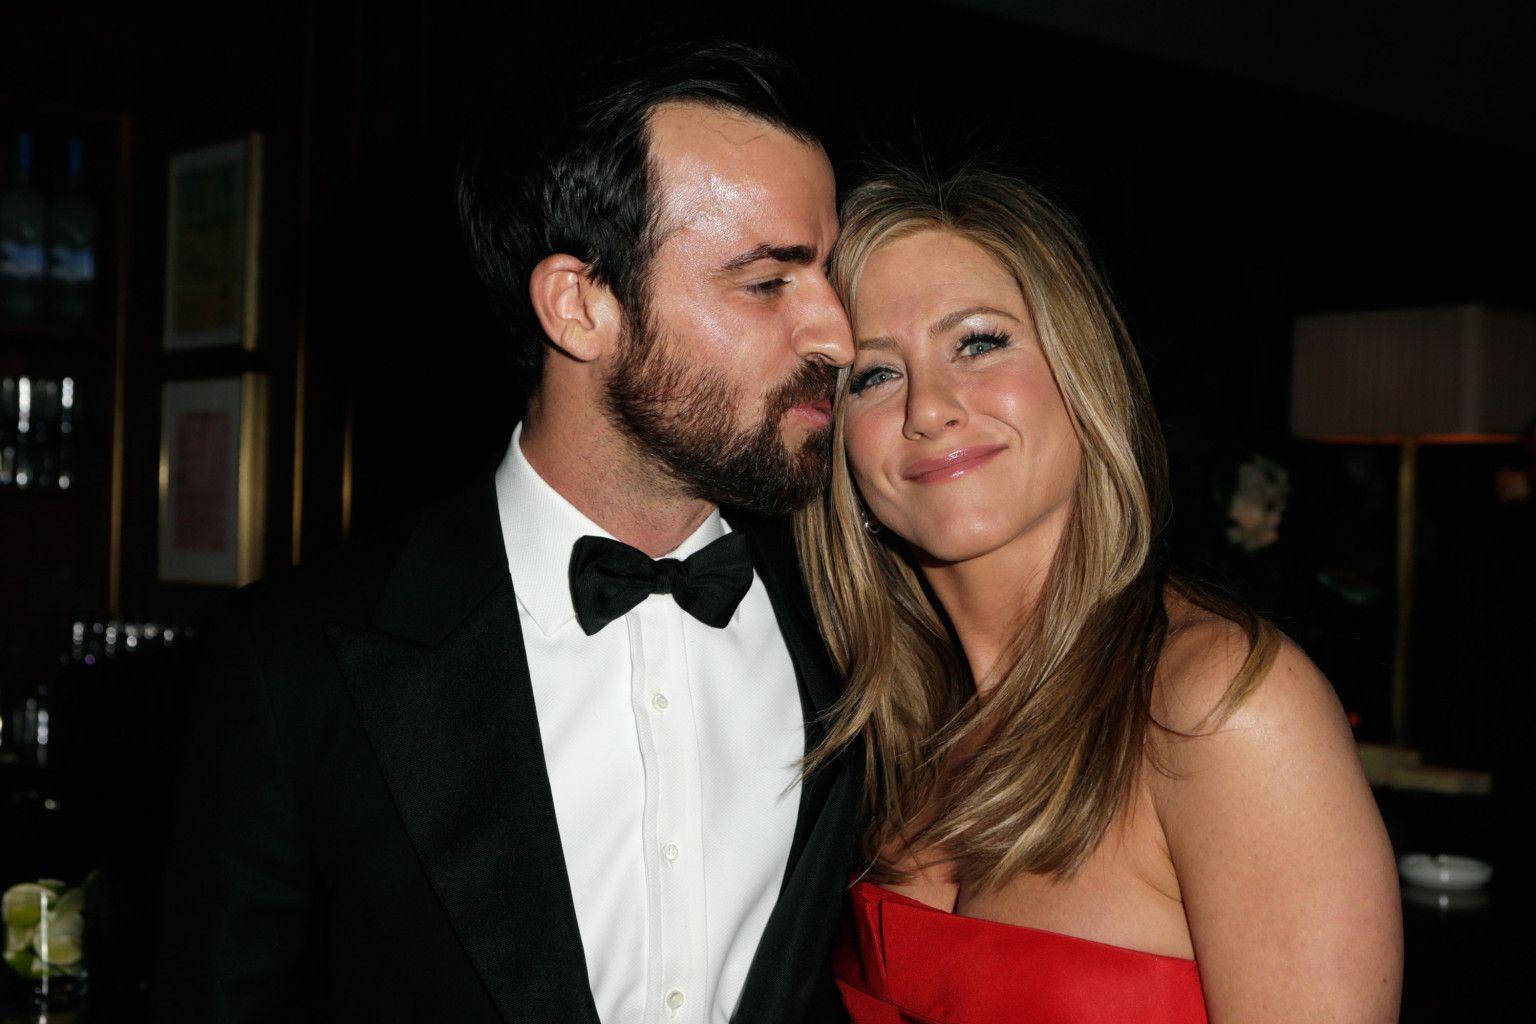 La tragedia que rodeó la luna de miel de Jennifer Aniston y Justin Theroux